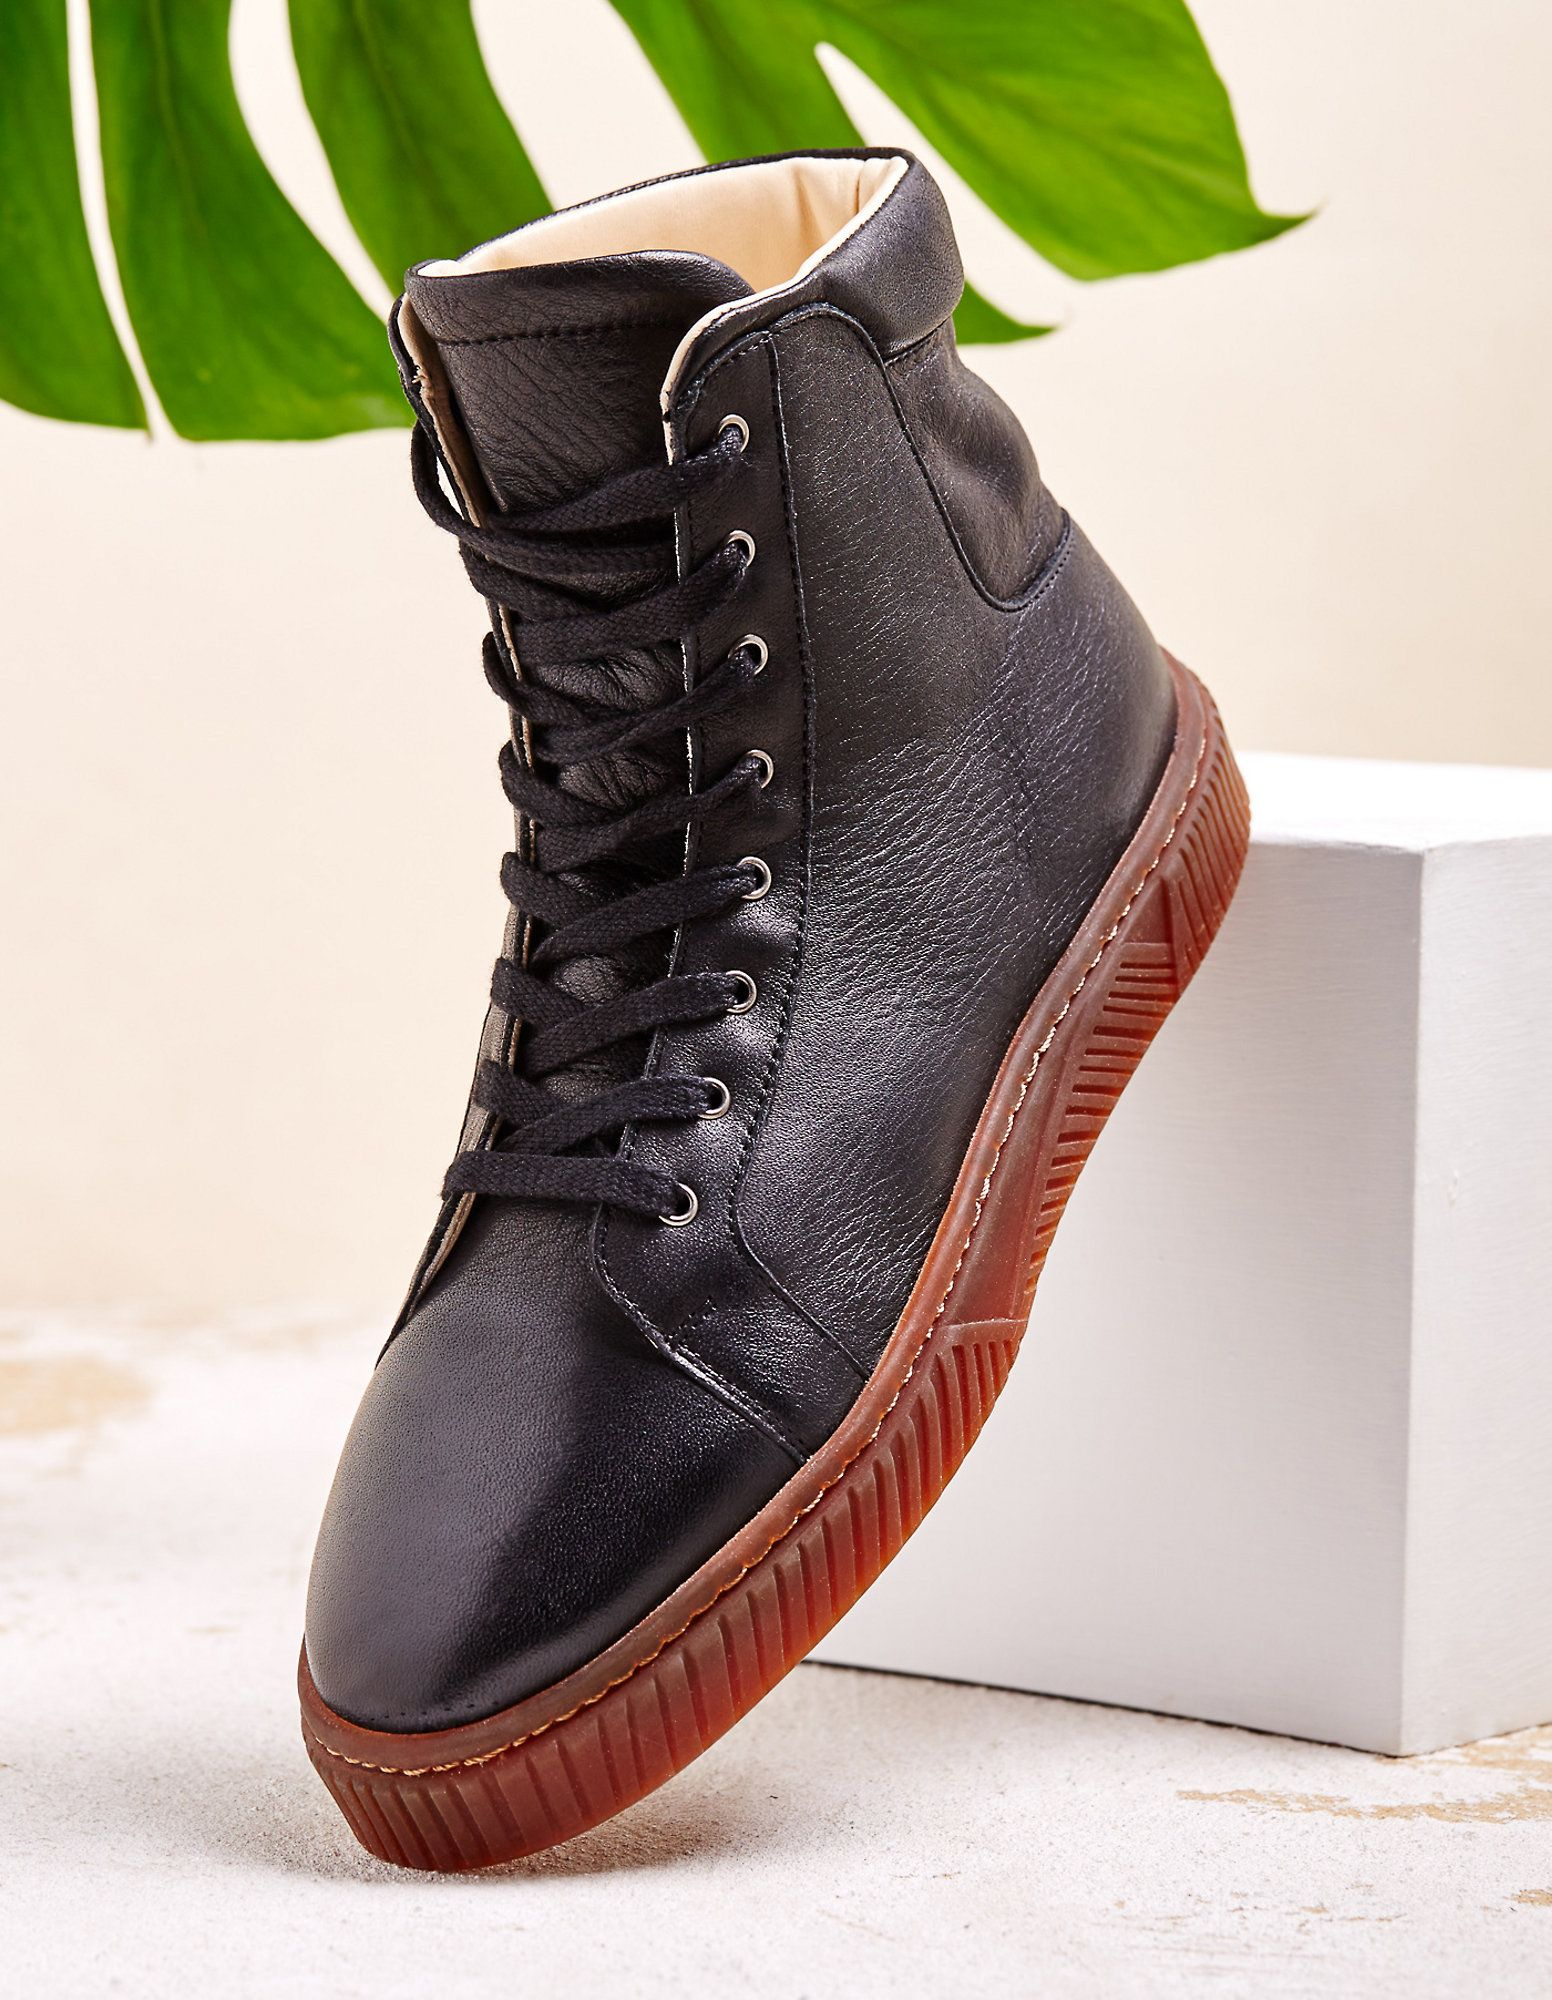 online store 12260 0a744 Werner Schuhe Sneaker Tanaja, schwarz | Laura Deerberg ...